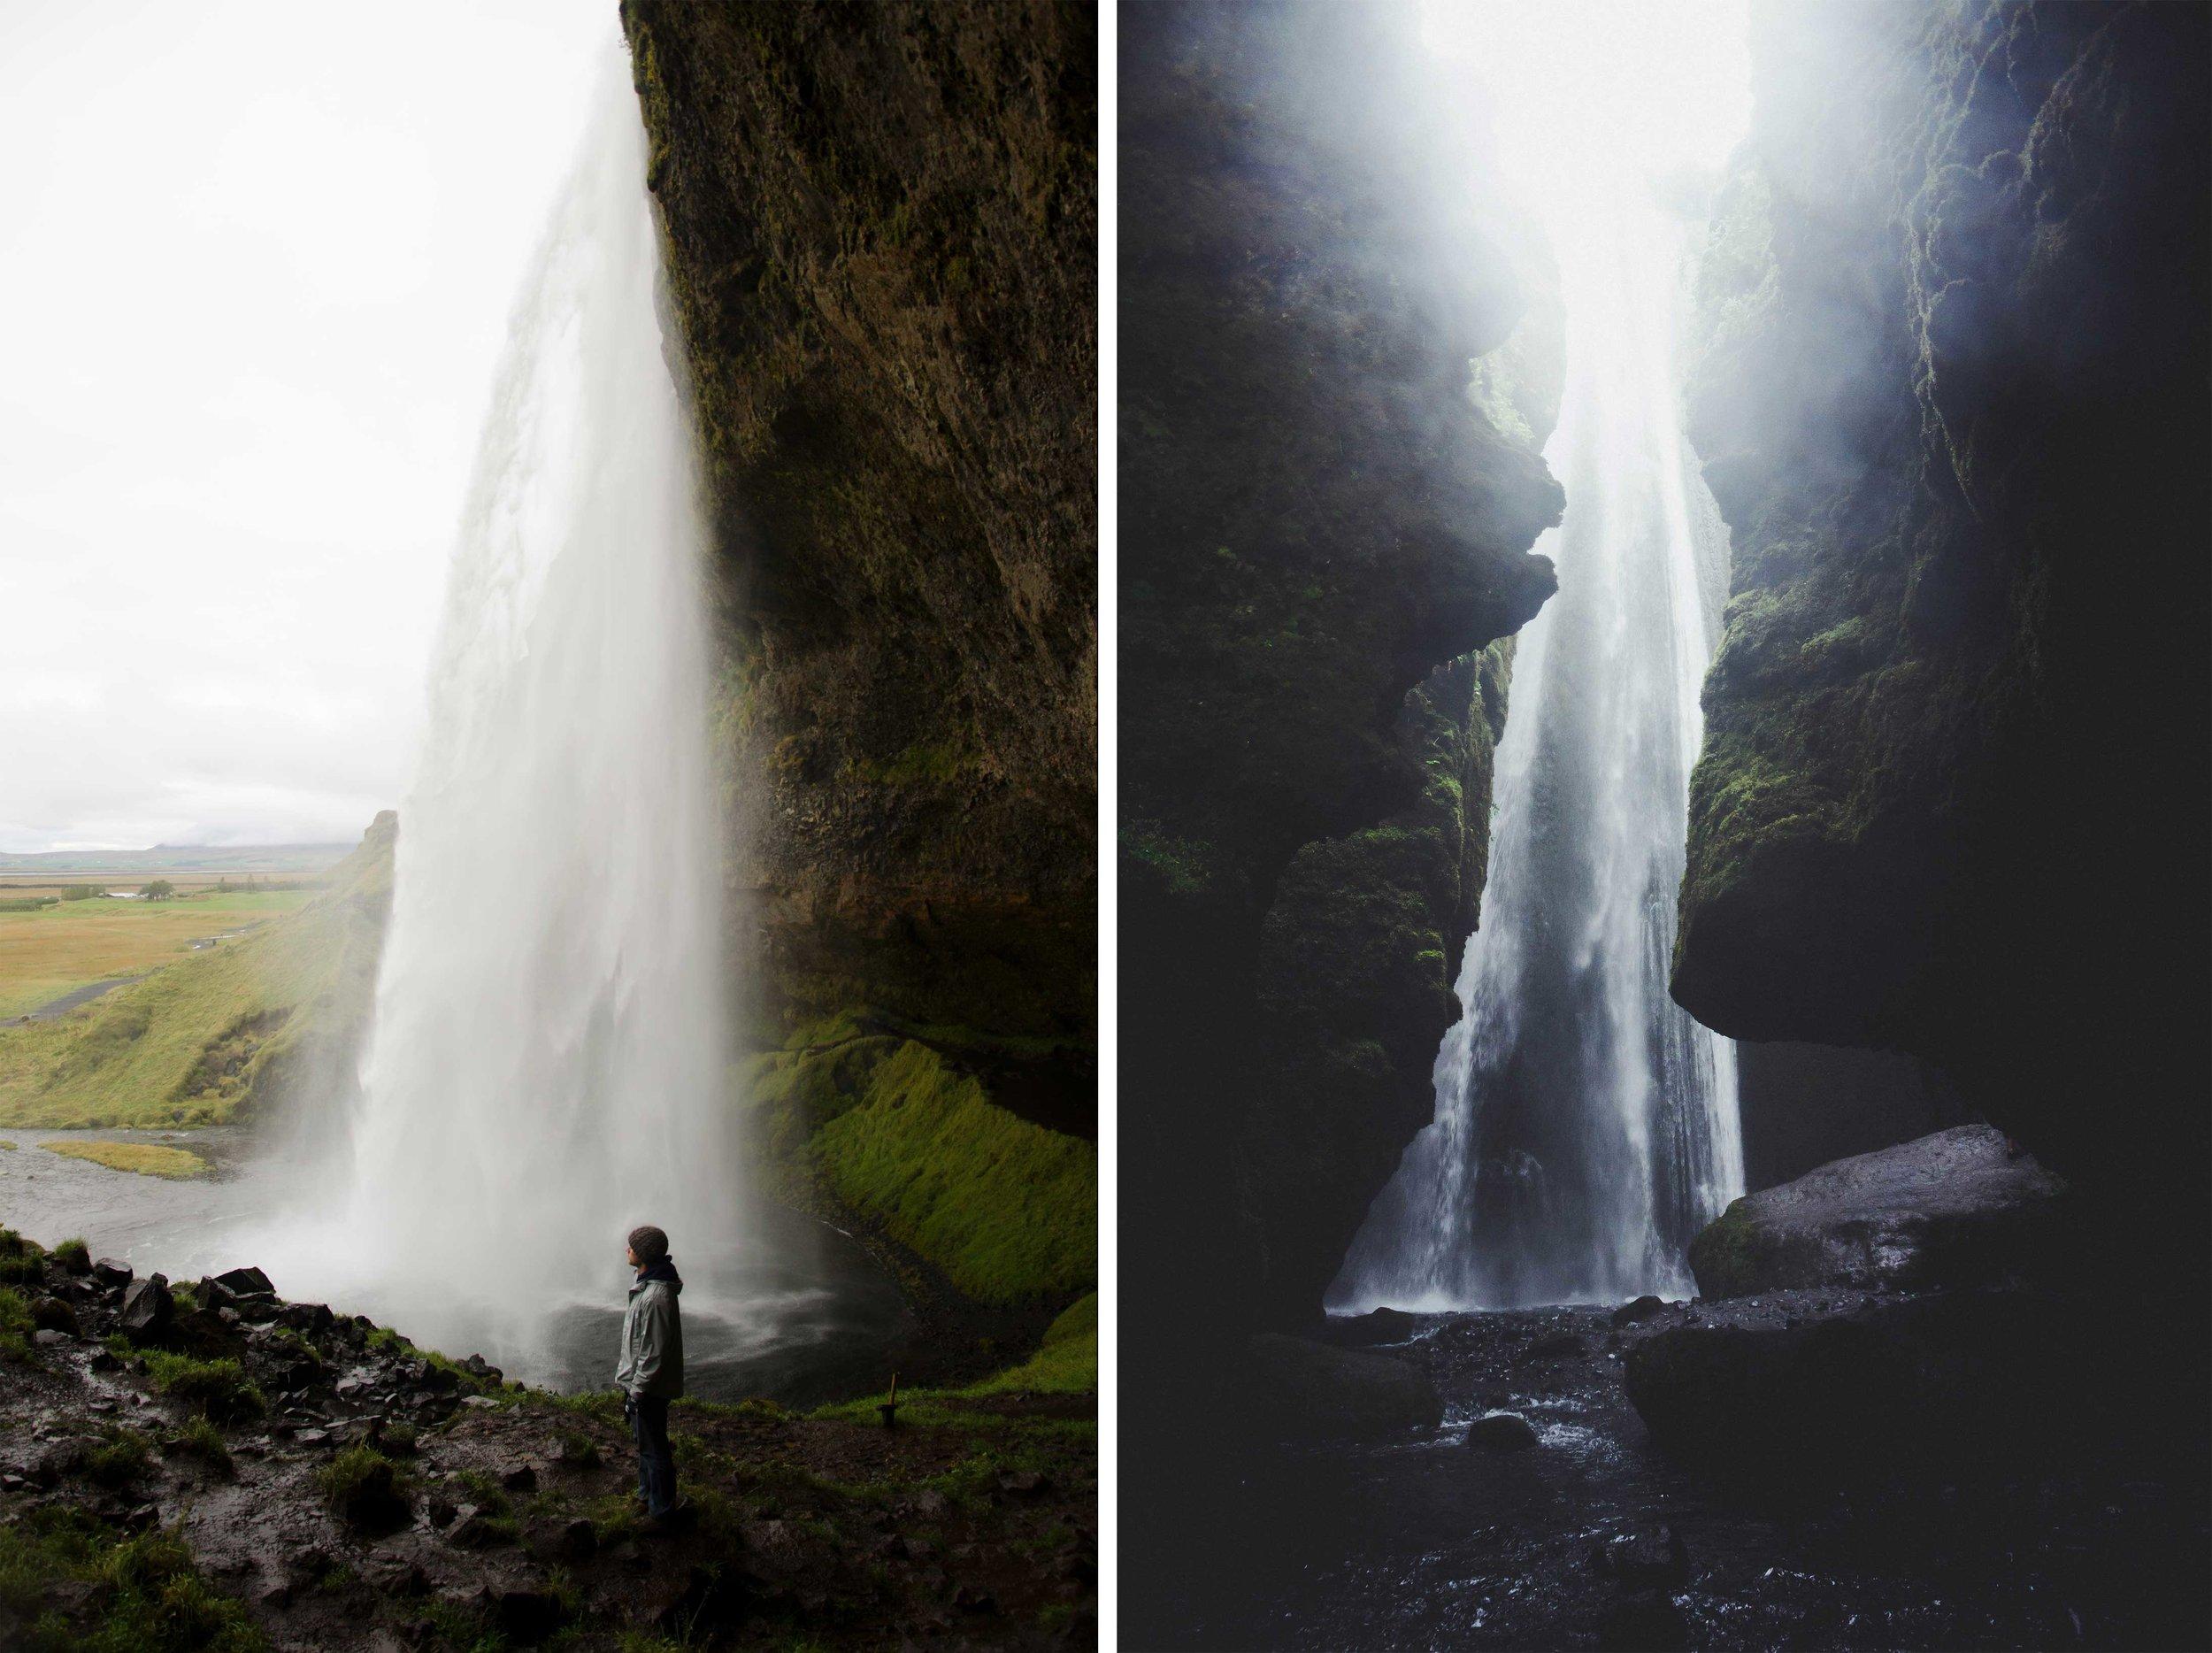 Left: Seljalandsfoss, Day 3|  Right: Gljúfrafoss, Day 3